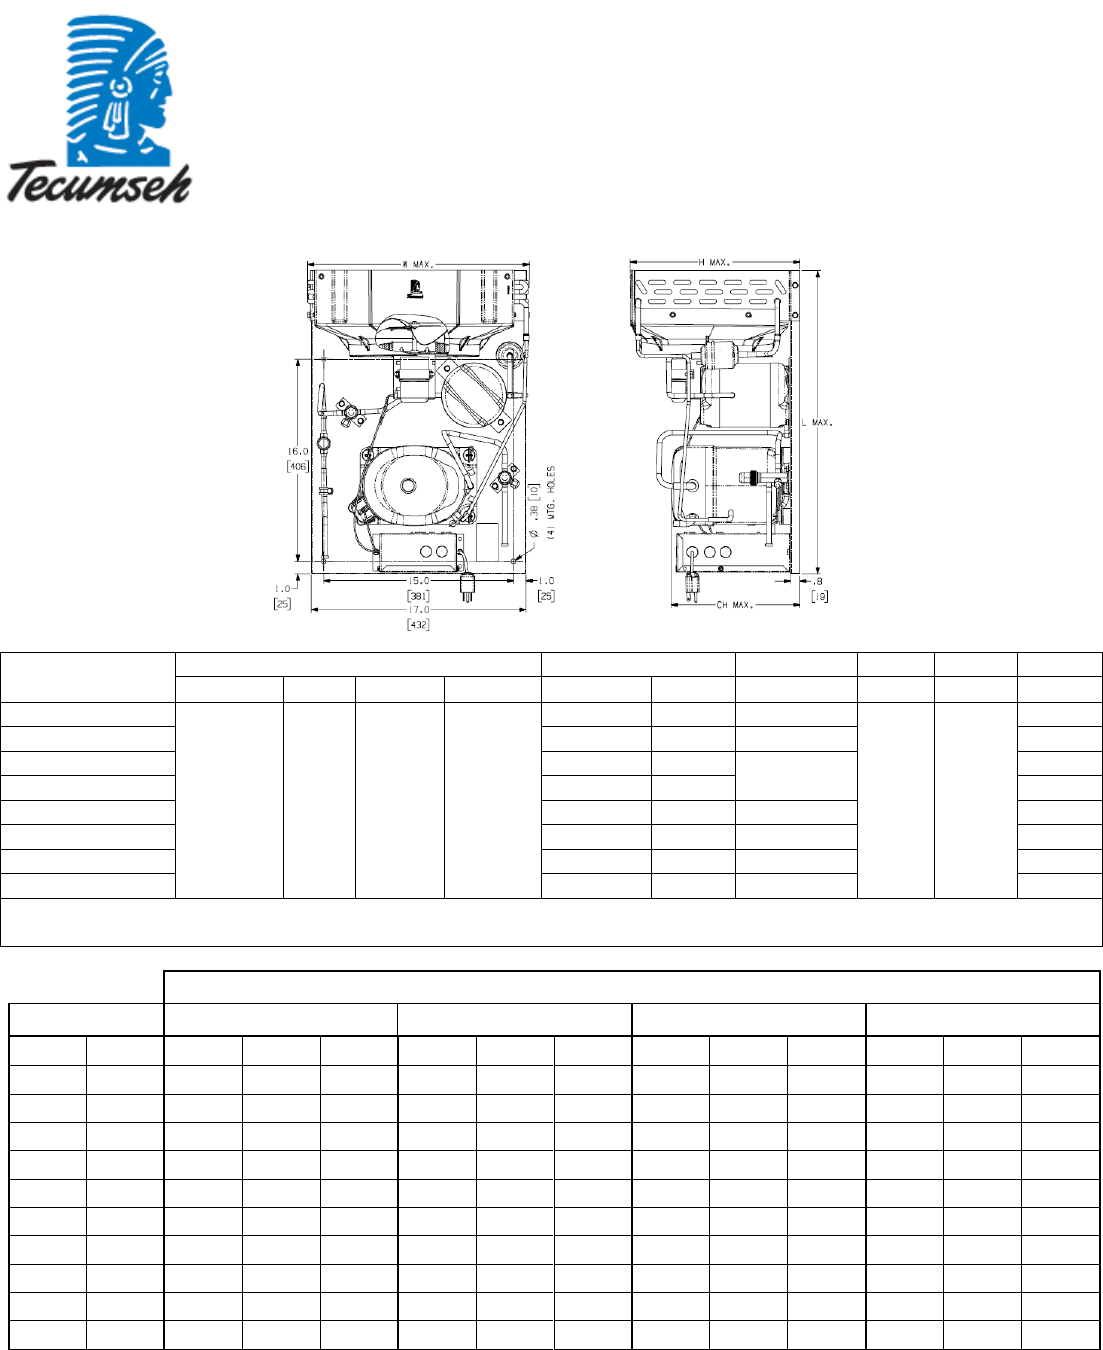 Zig Unit Cf 2000 Wiring Diagramwiring Diagram And Schematic Design Caravan Unique Ornament Ideas